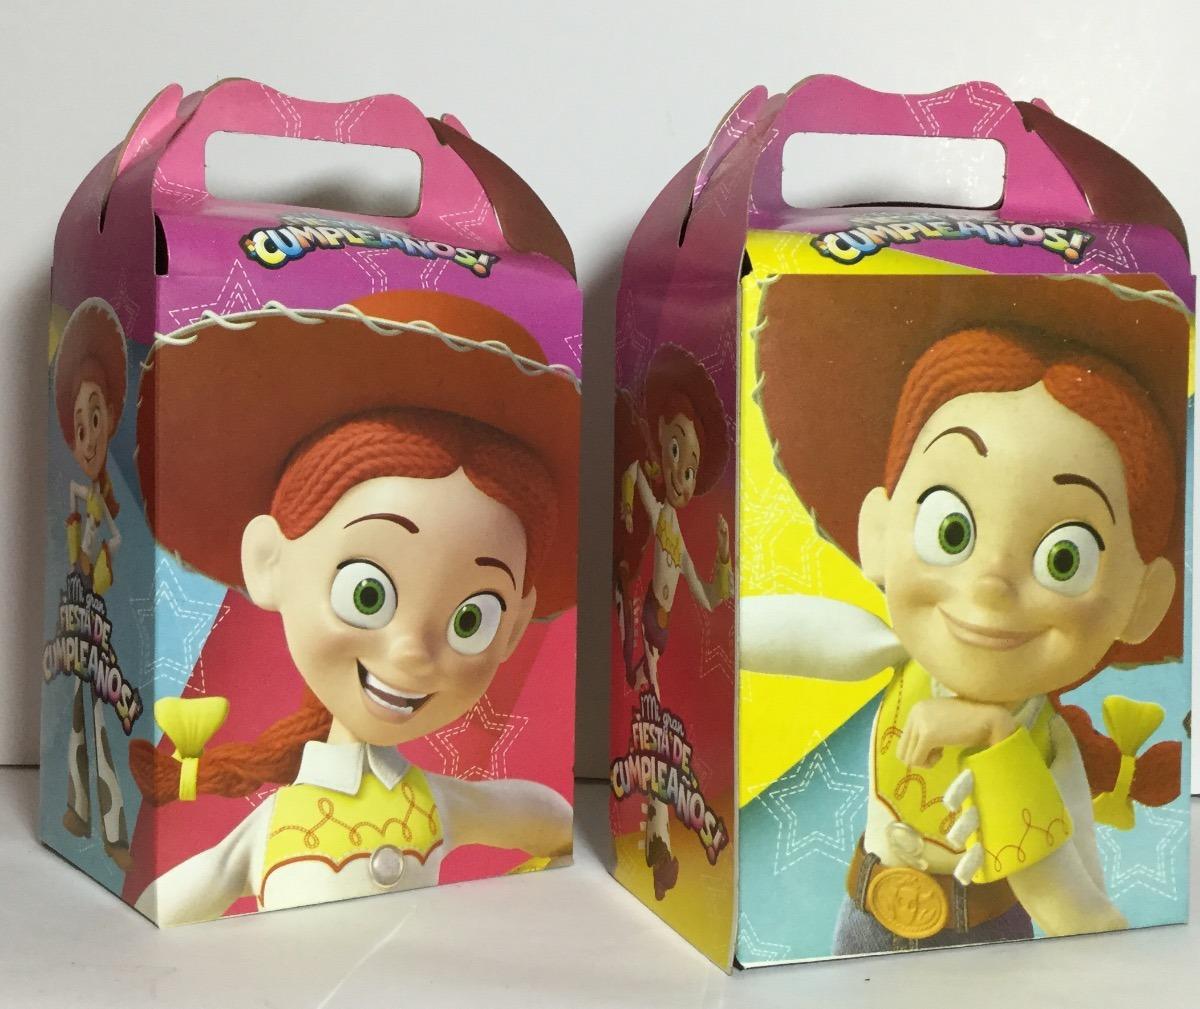 jessie toy story cajas dulceras para tu fiesta promocion. Cargando zoom. 4020c5d350d